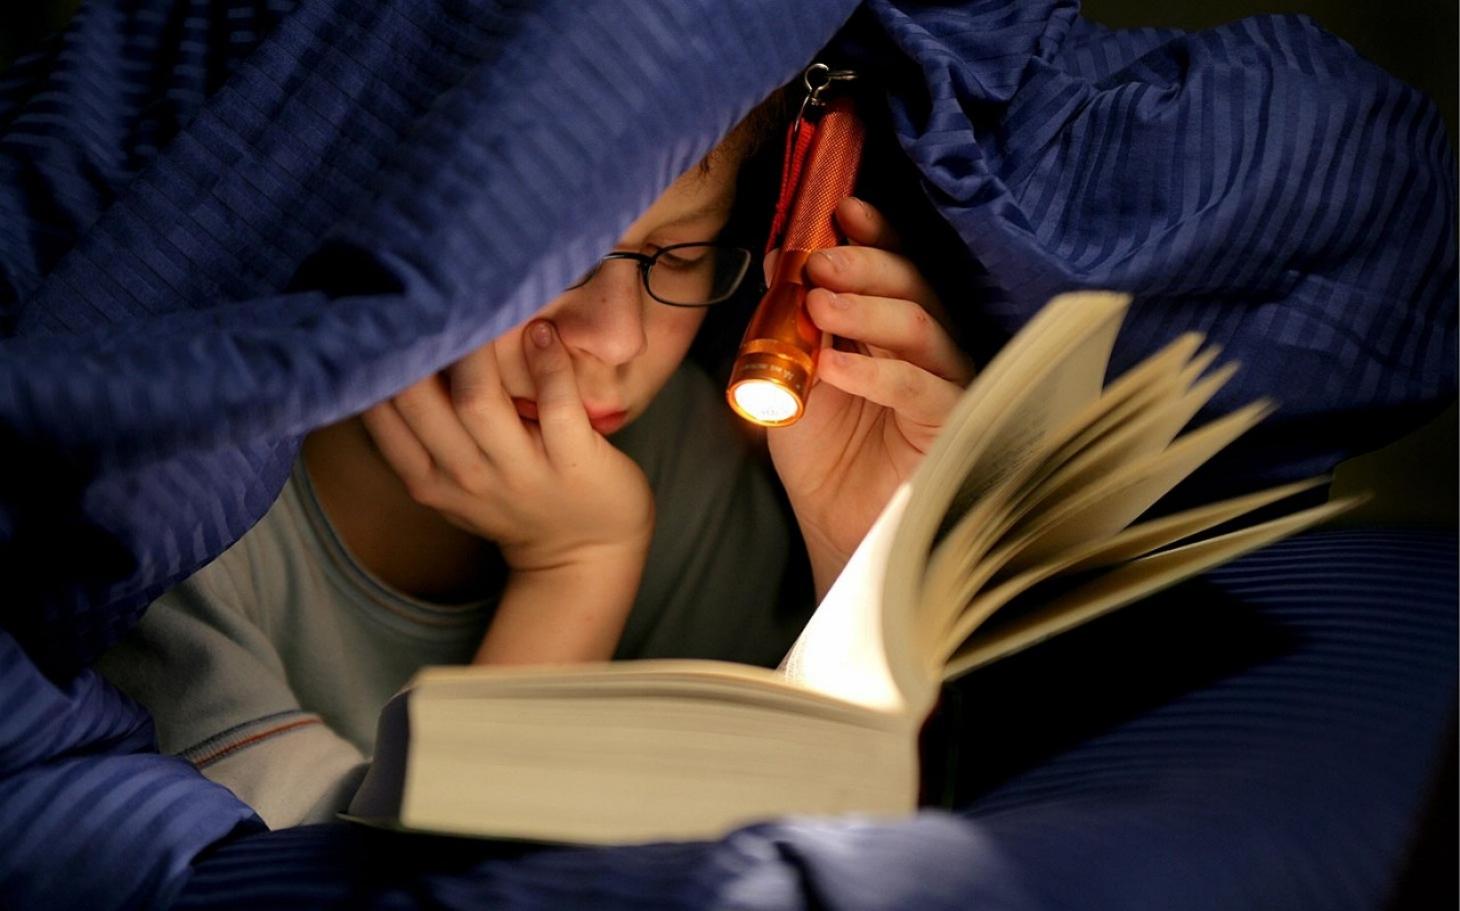 Fewer American kids reading for pleasure | Al Jazeera America